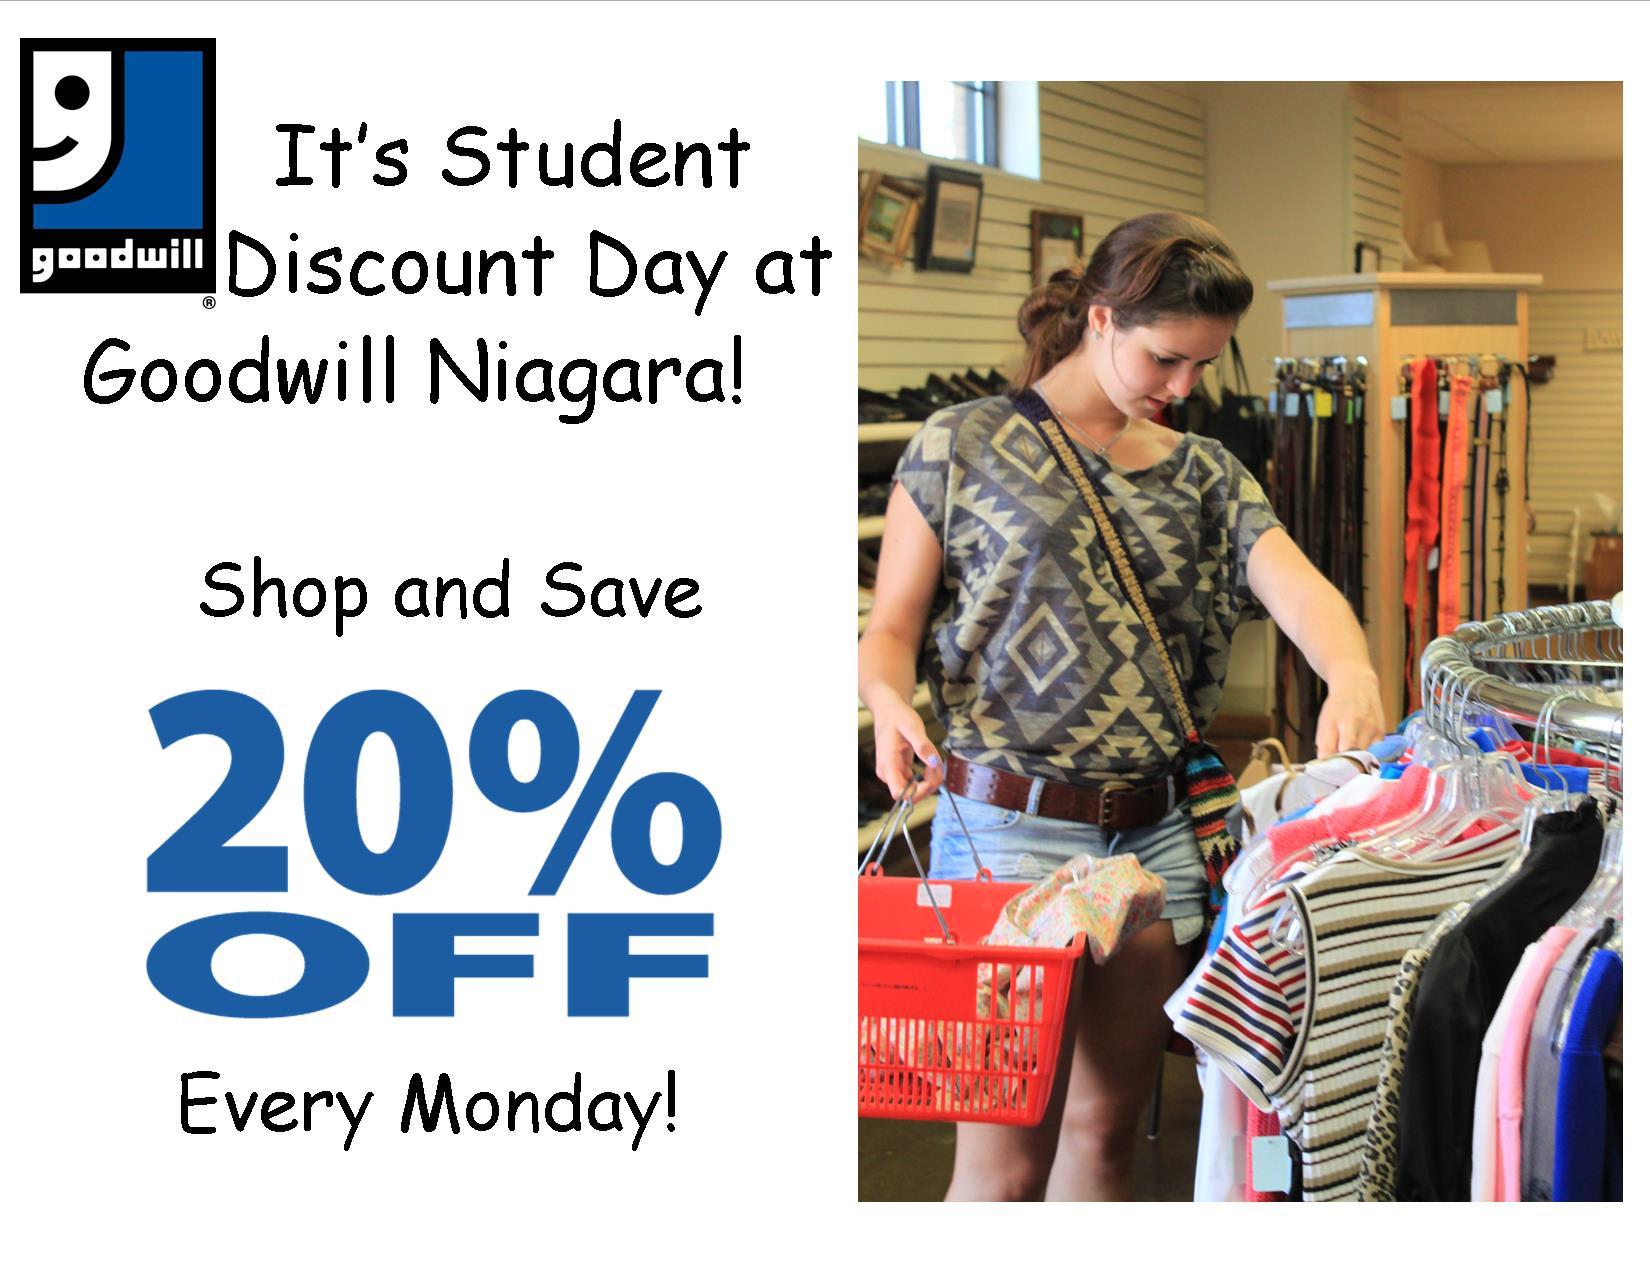 Student Discount Monday